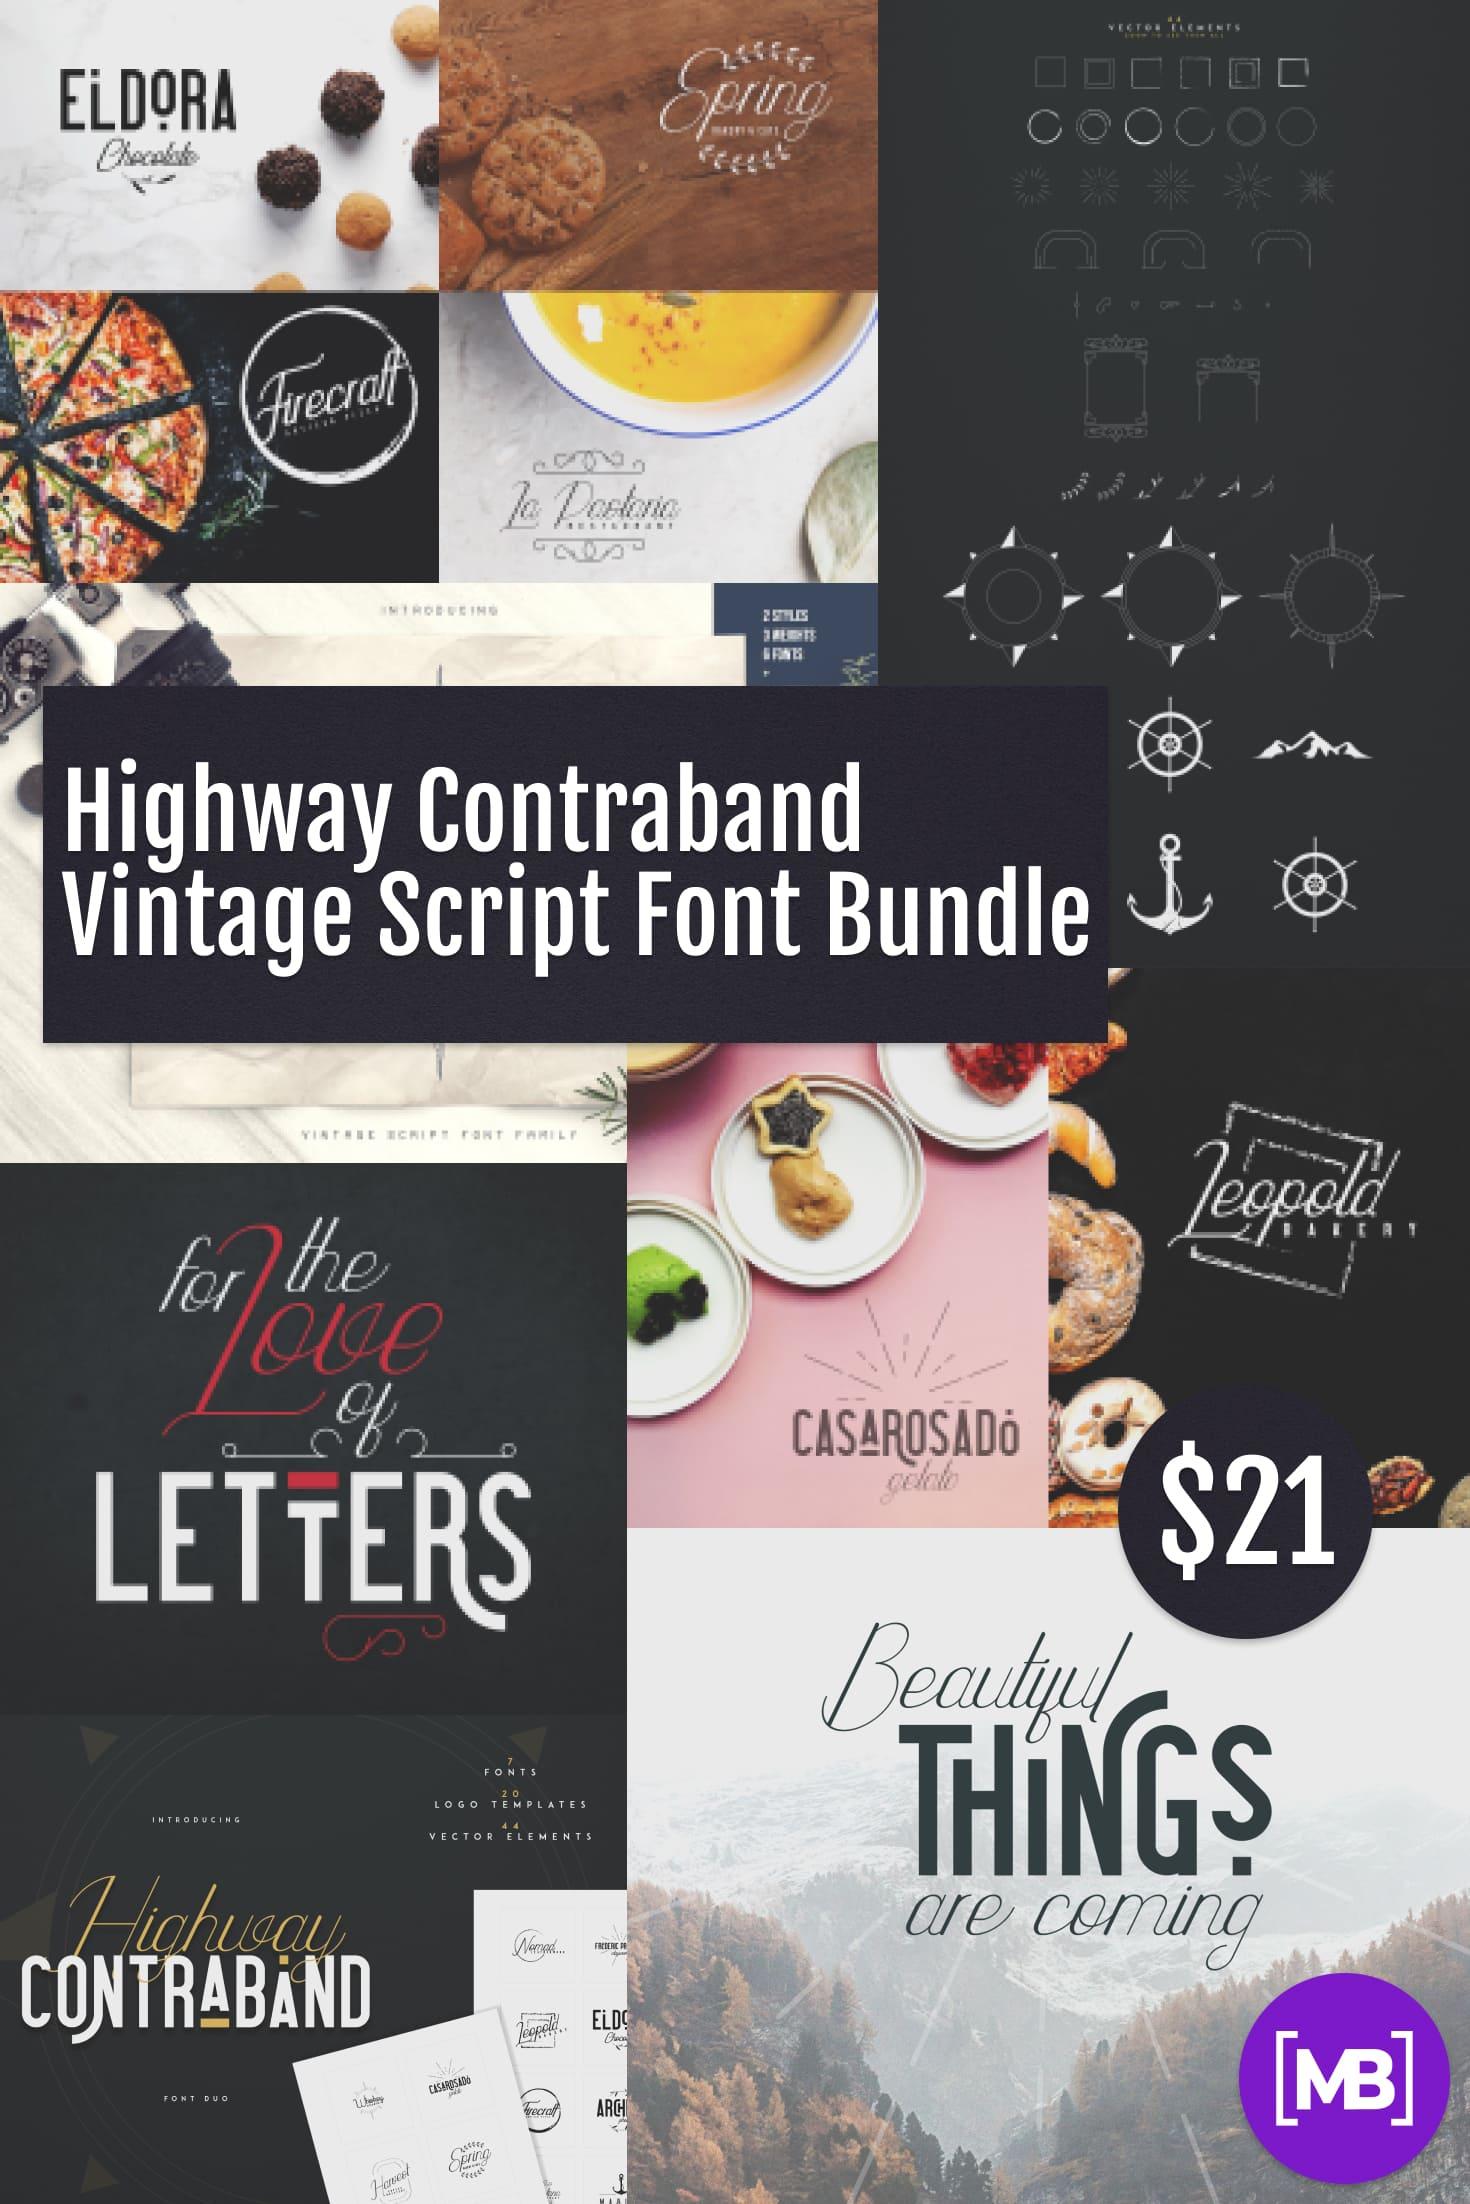 Pinterest Image: Highway Contraband Vintage Script Font Bundle: Font Duo + 20 Logo Templates + 44 Vector Elements.